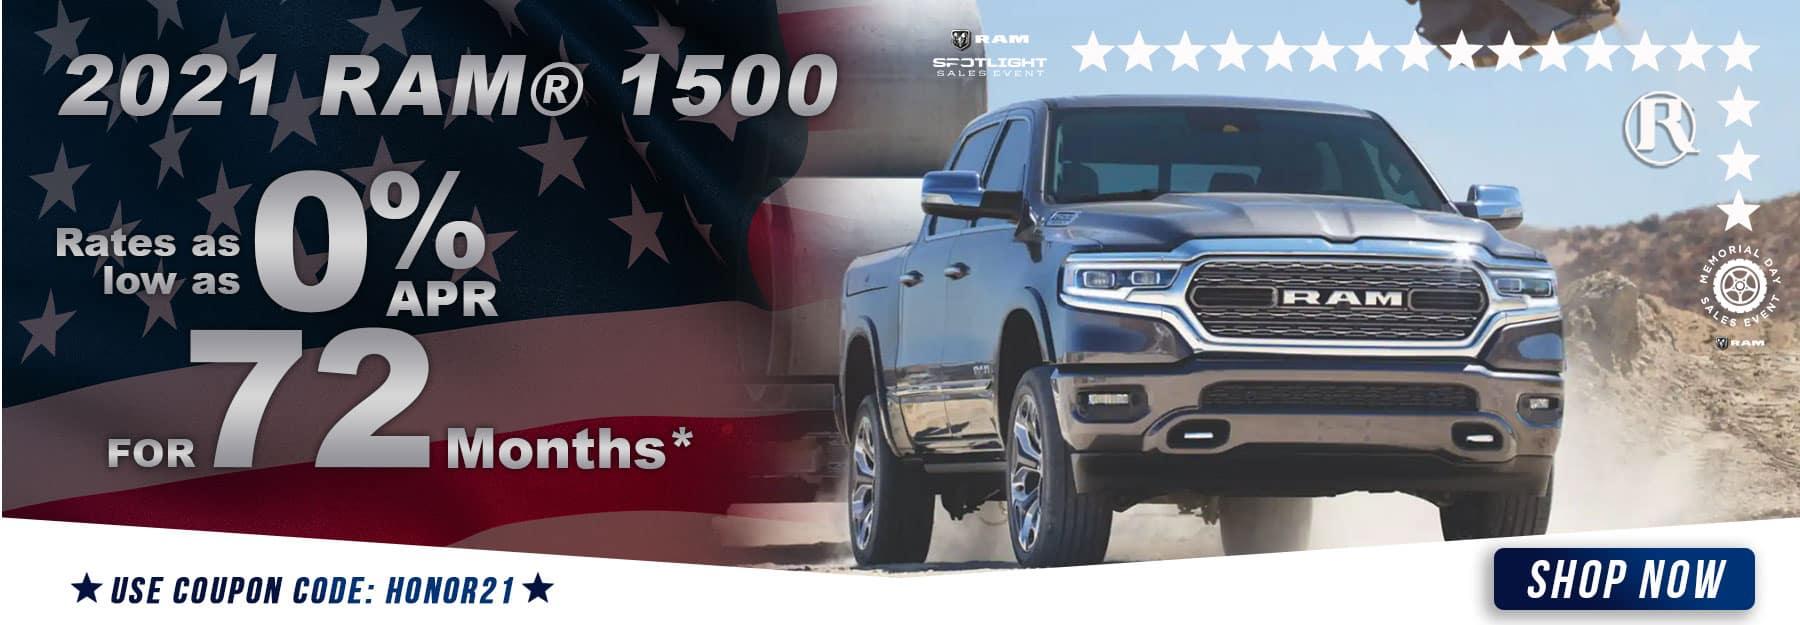 2021 RAM 1500 Reed RAM Kansas City